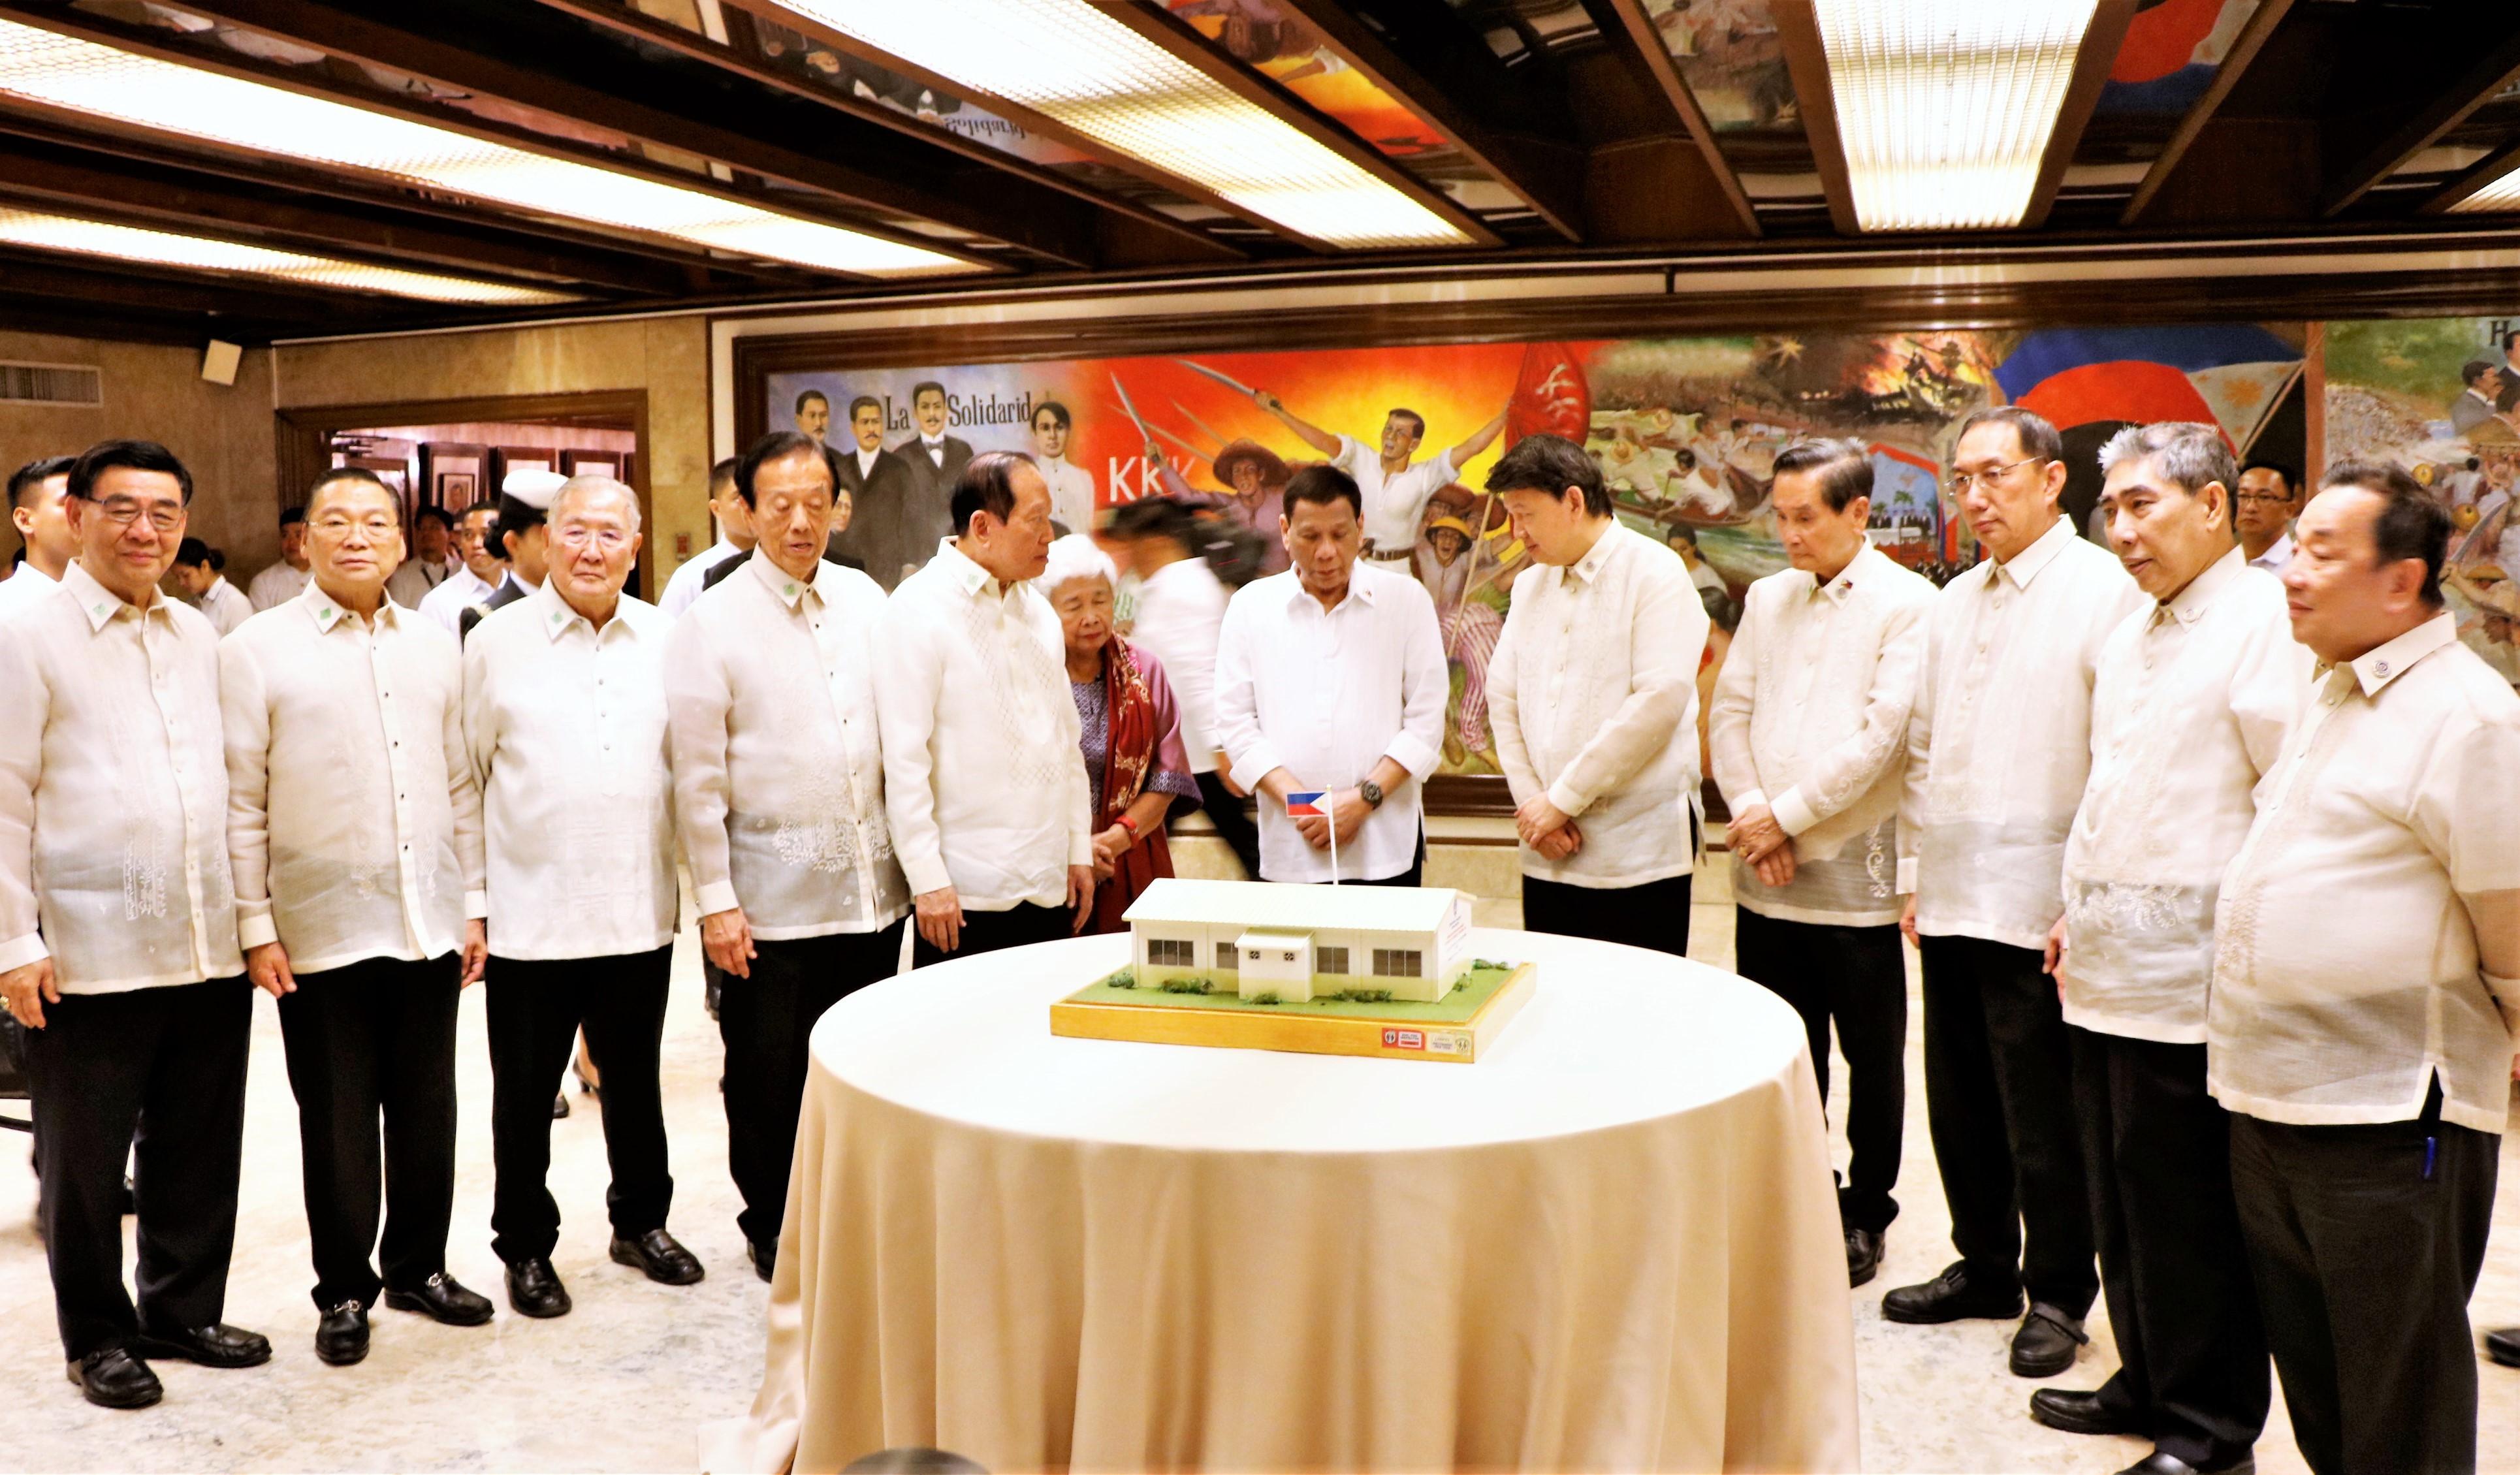 FFCCCII donates 700 public schools at induction with Pres. Duterte